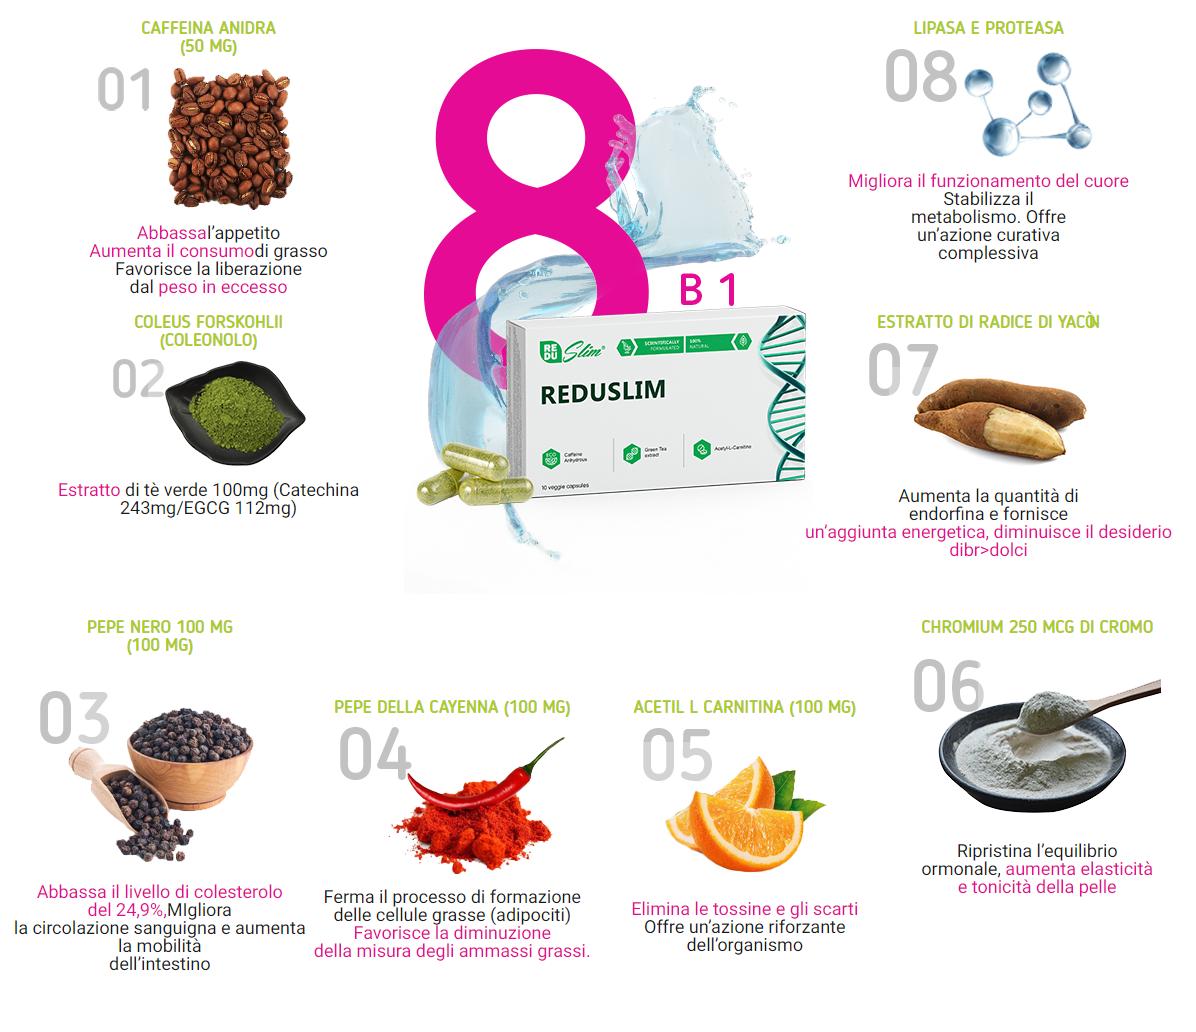 reduslim tabella degli ingredienti